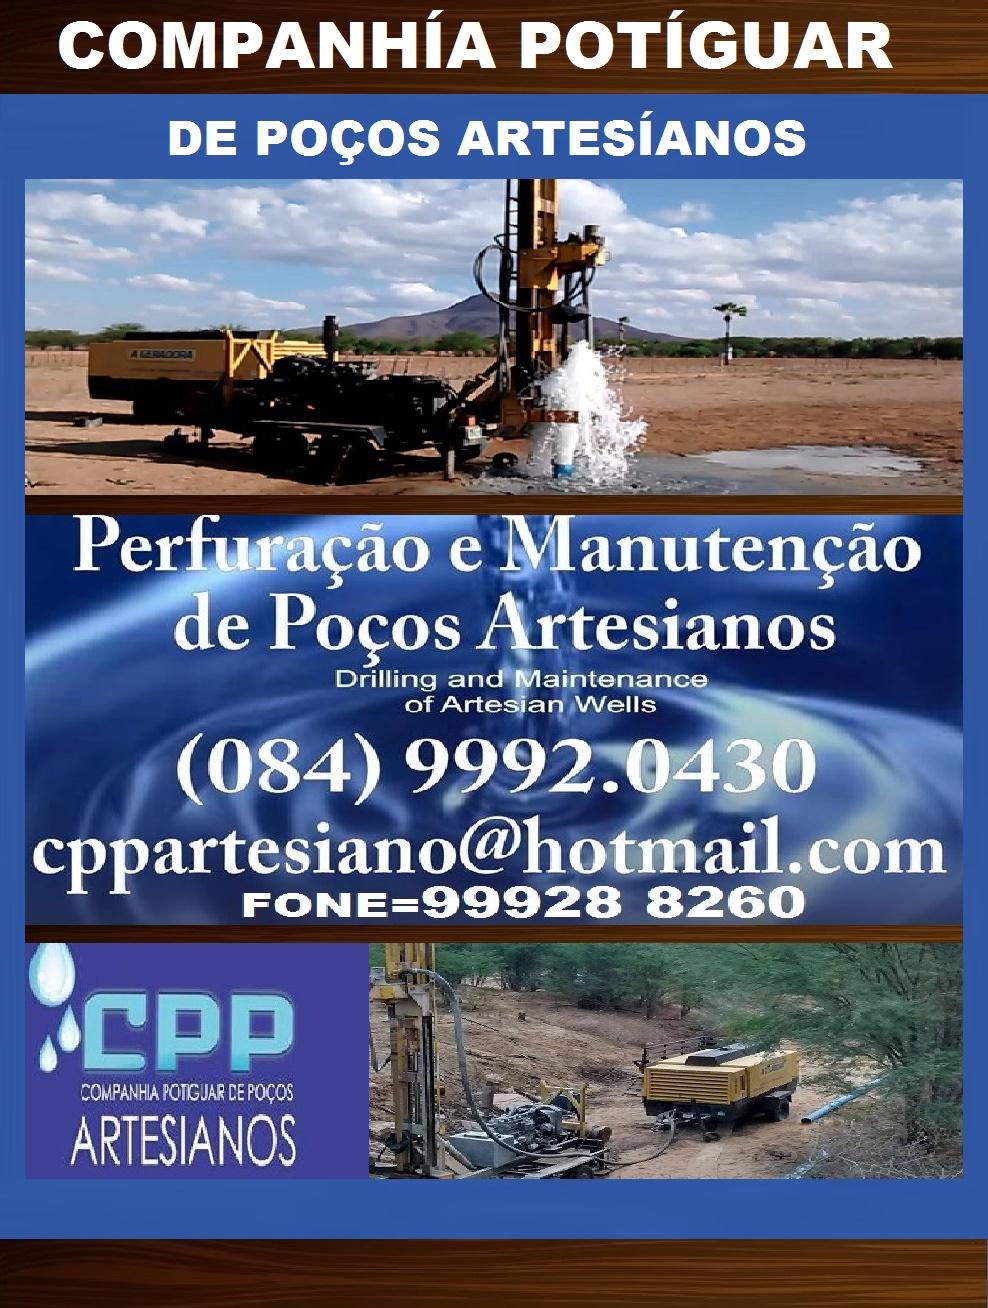 COMPANHÍA POTÍGUAR DE POÇOS ARTESÍANOS.